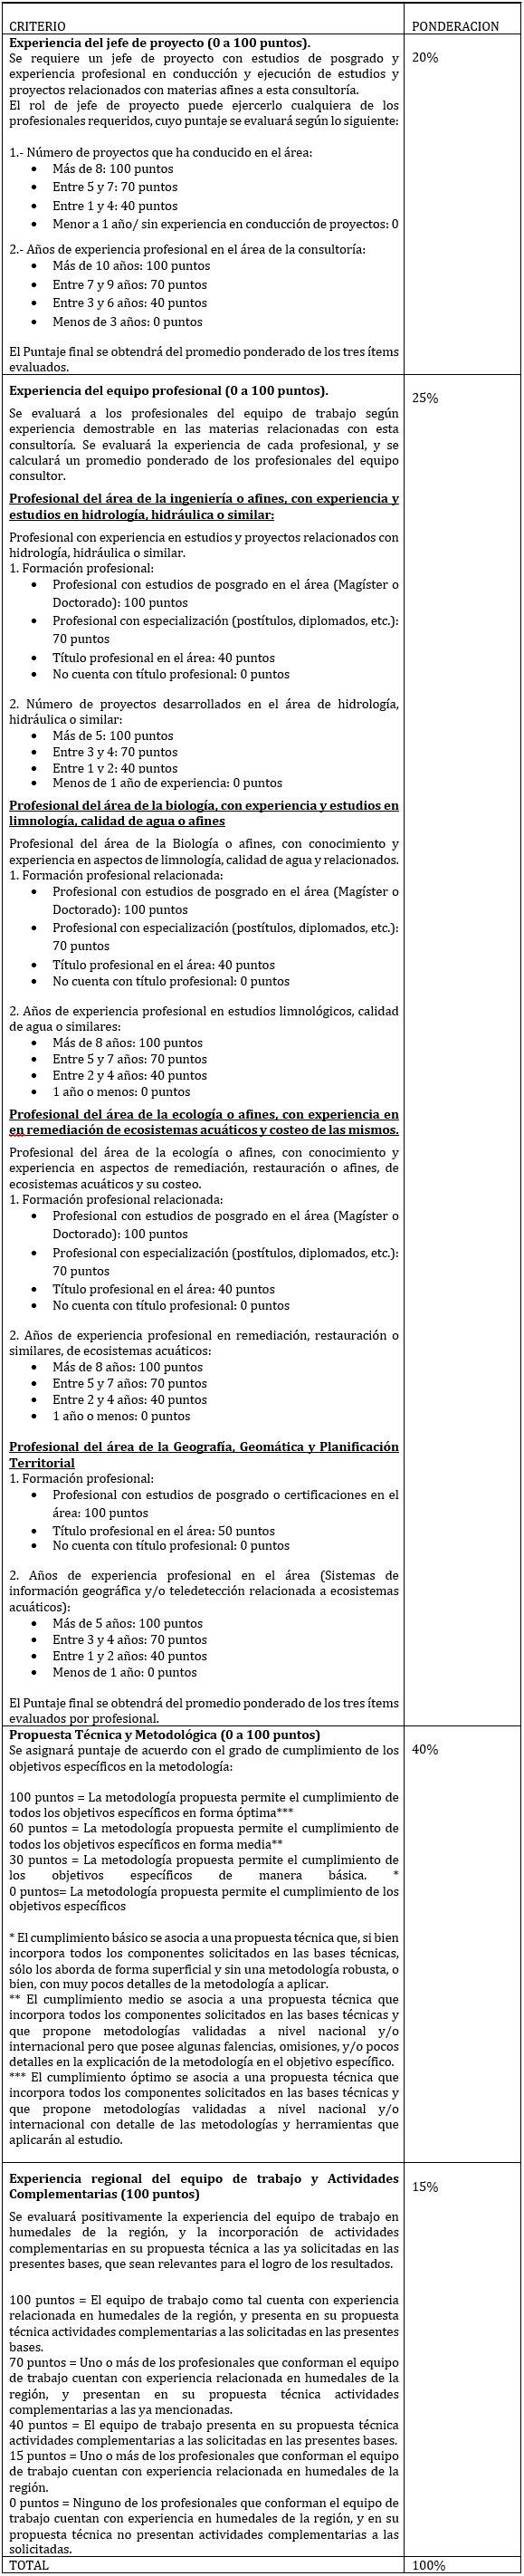 Criterios022021.jpg